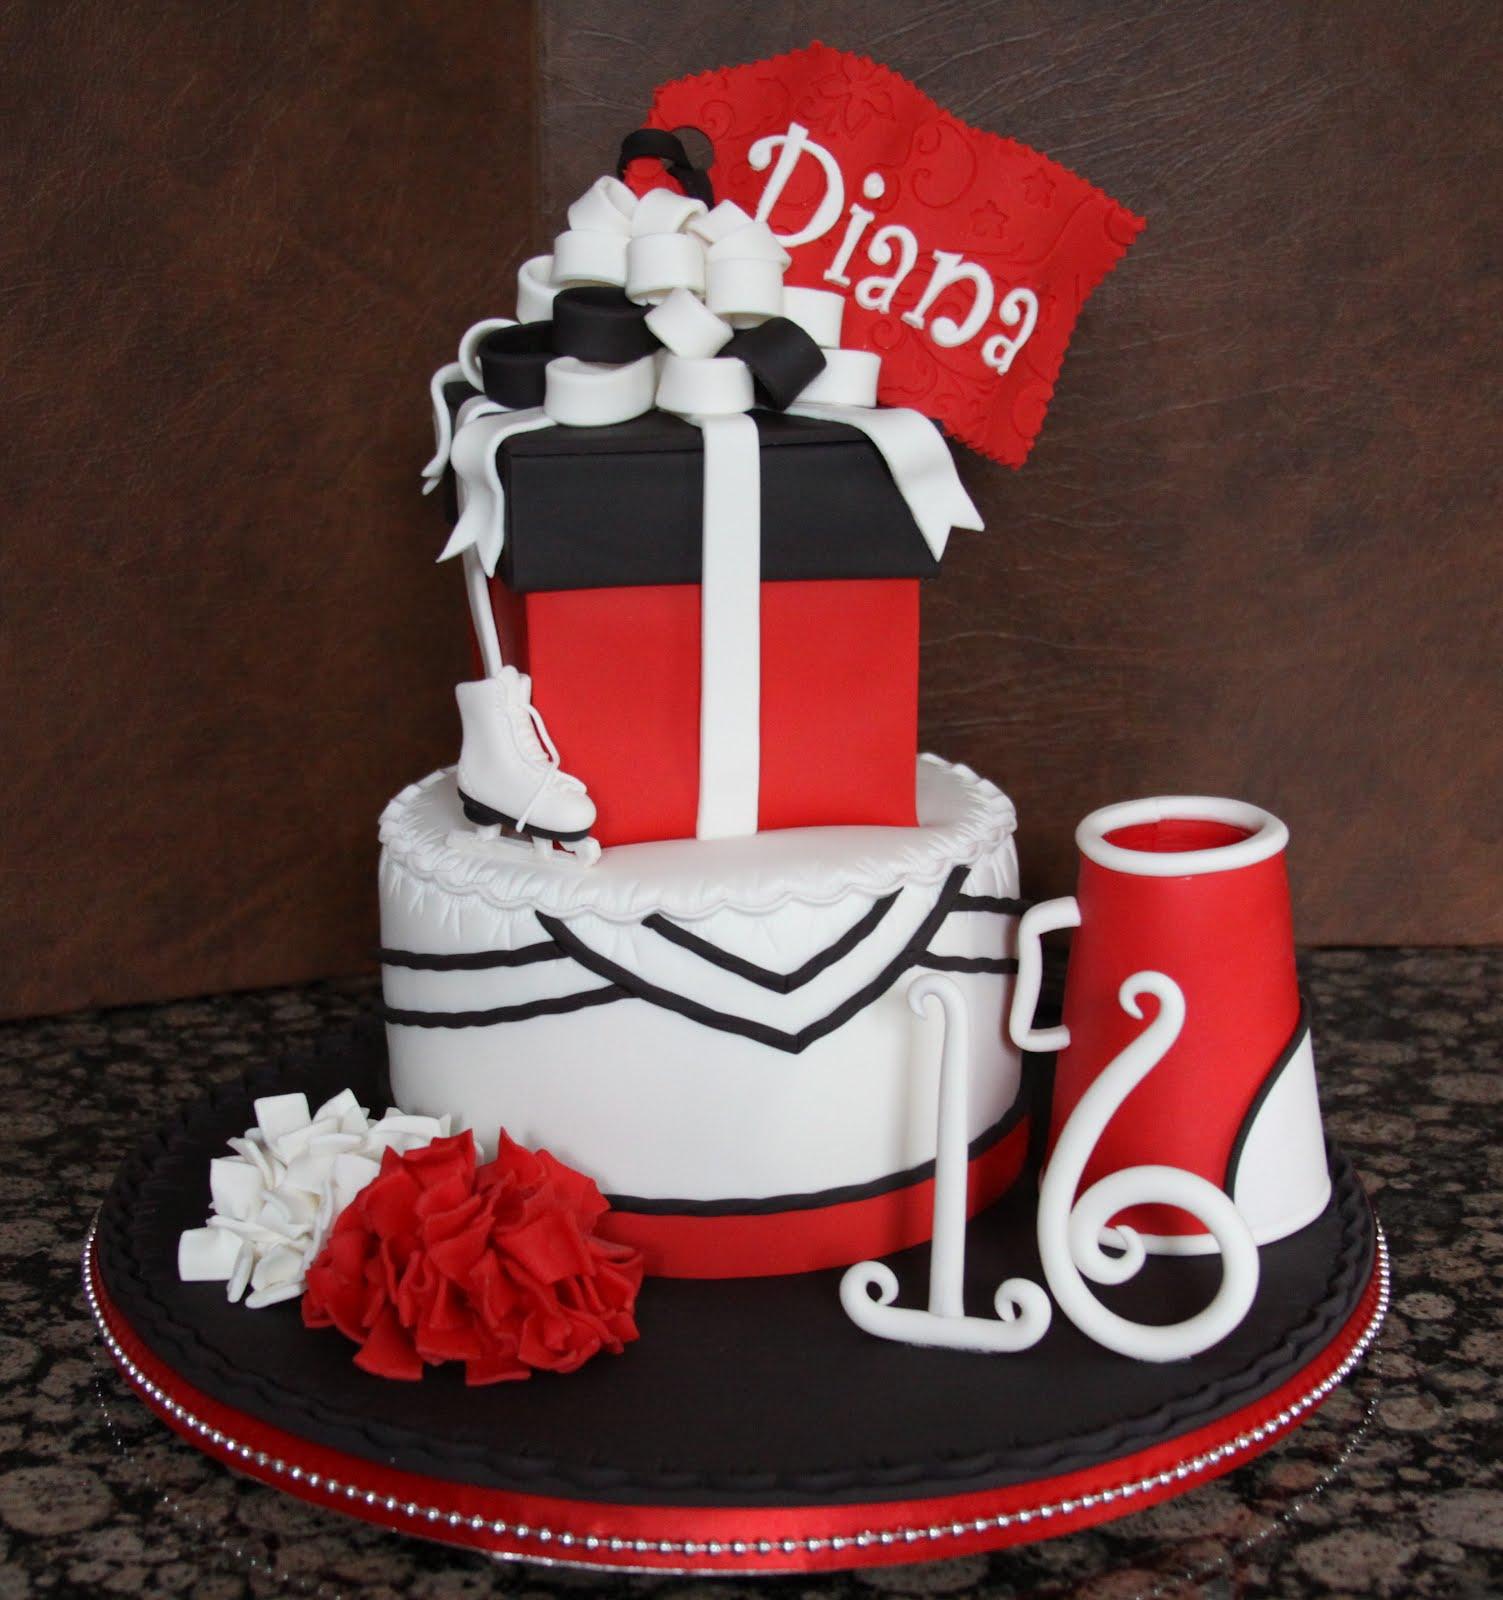 10 Cakes With Cheerleading Megaphone And Pom Pom Photo